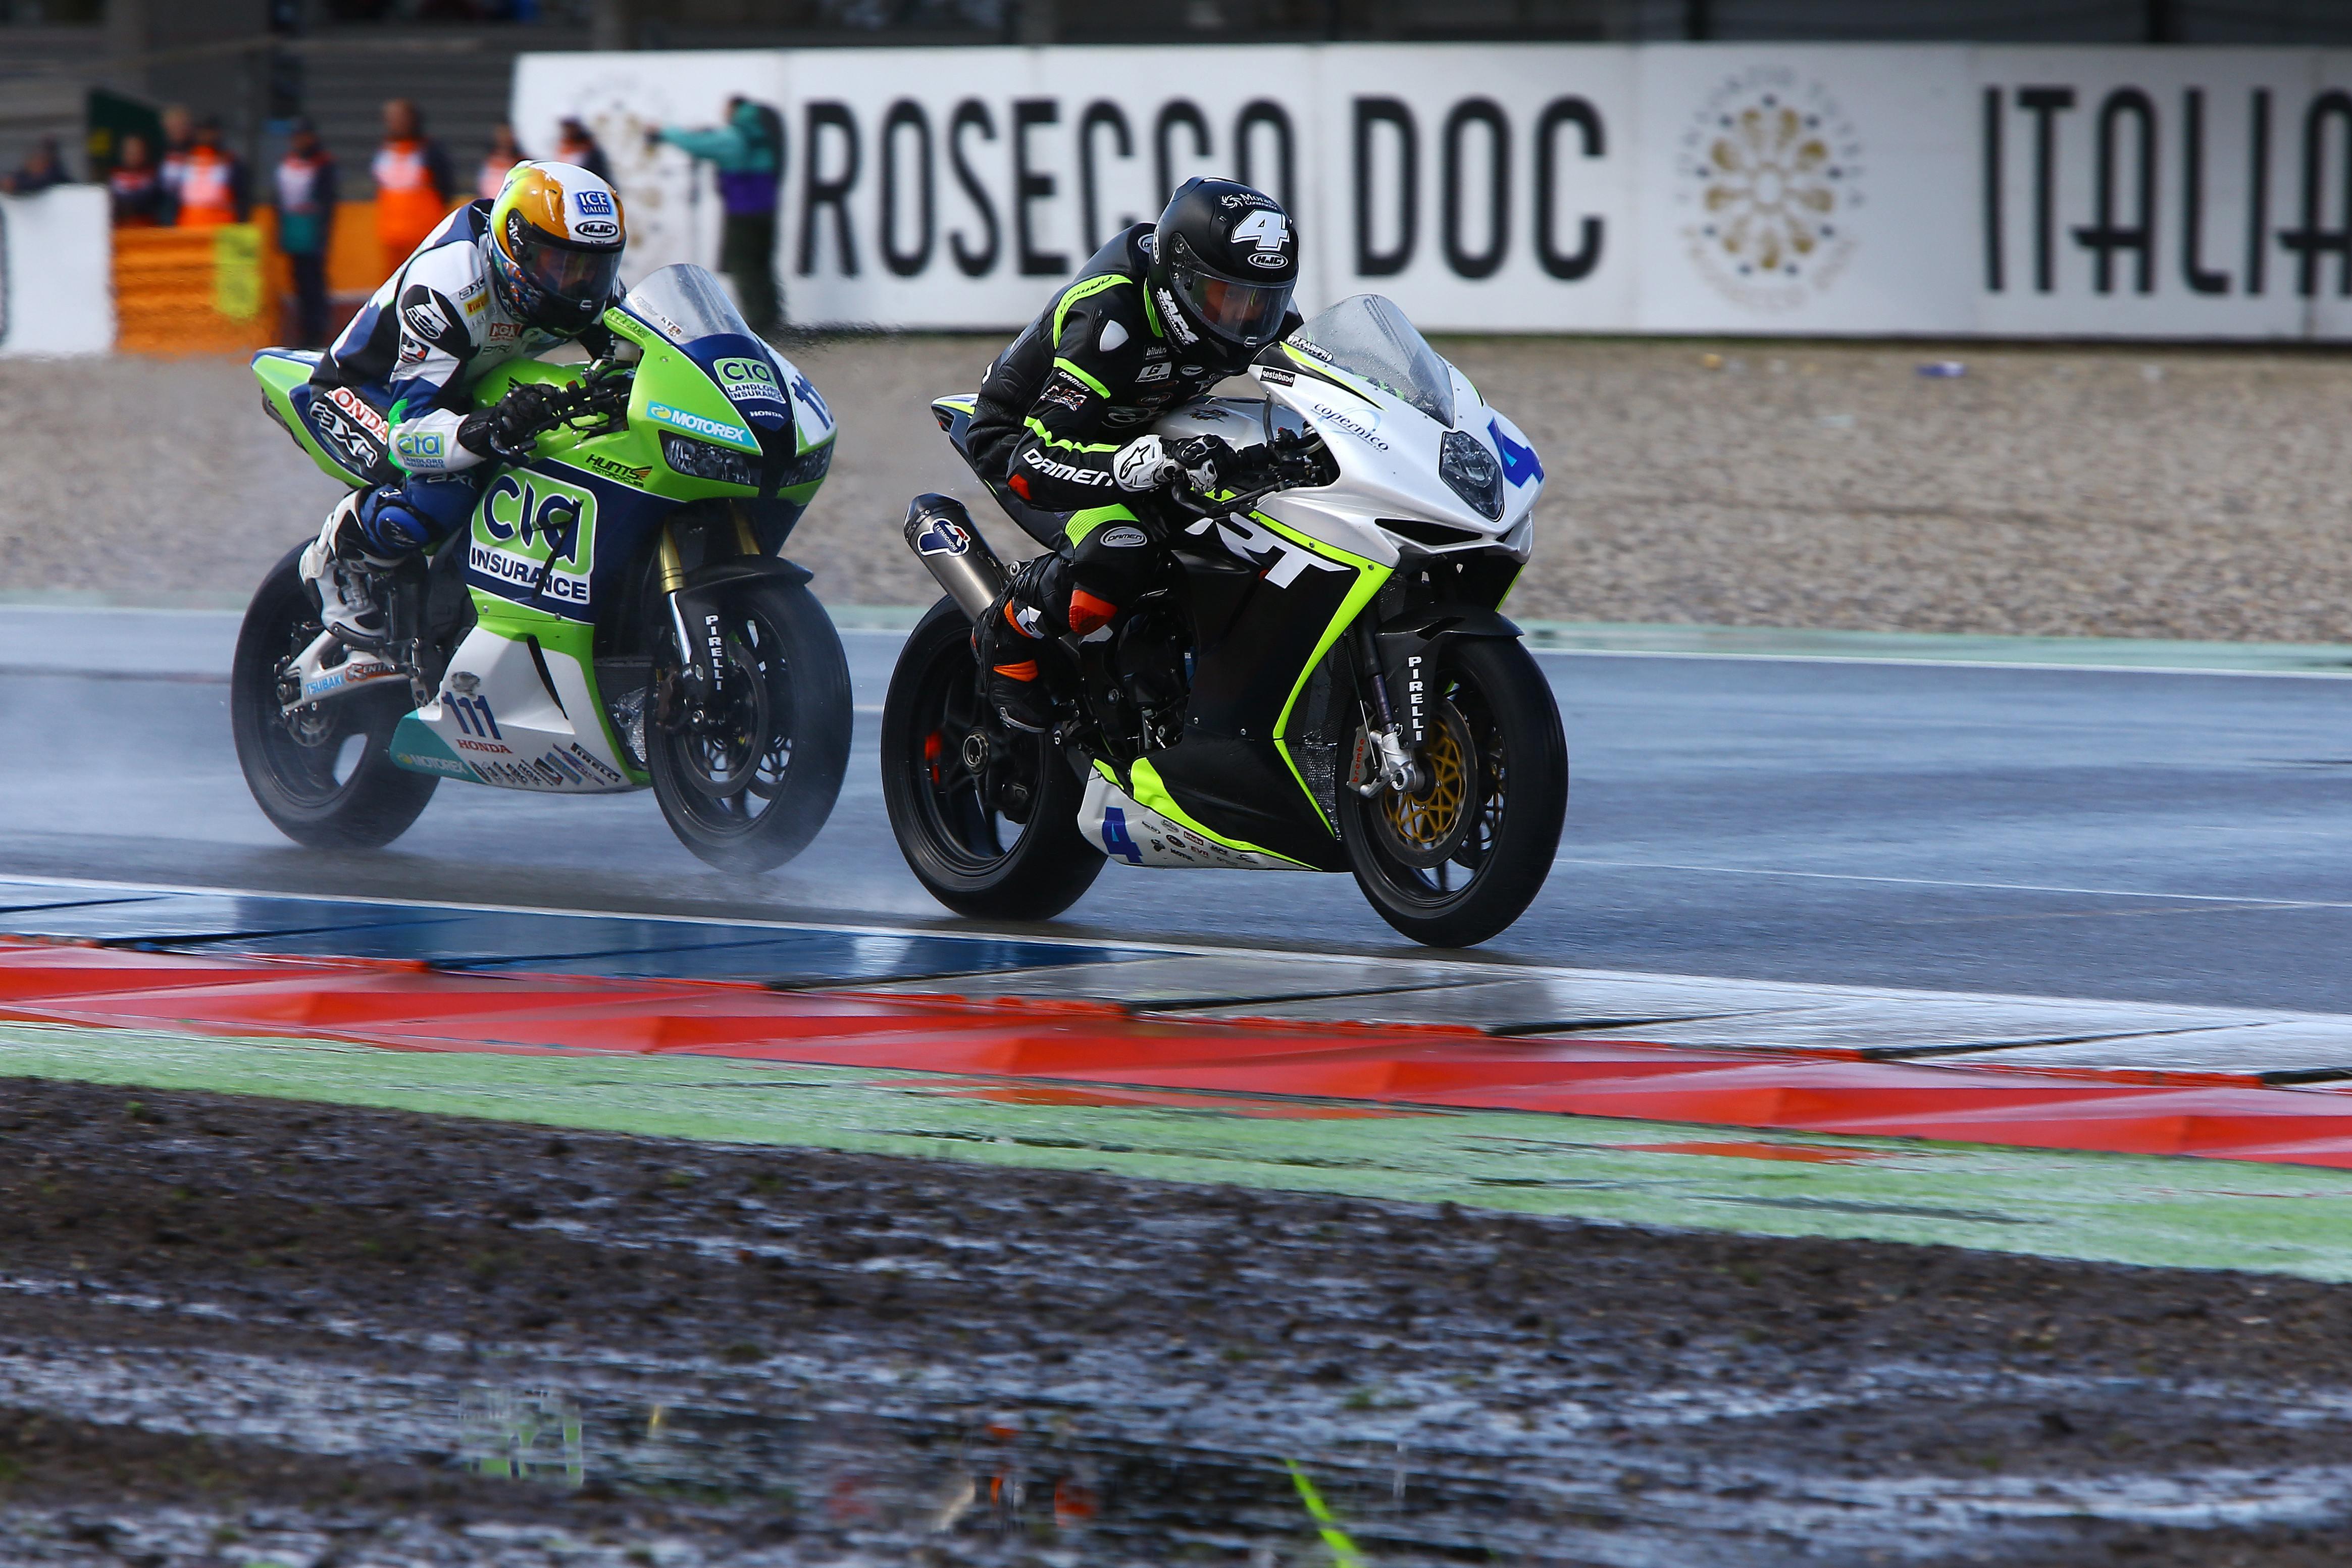 Assen_ned_ssp_race 303.JPG